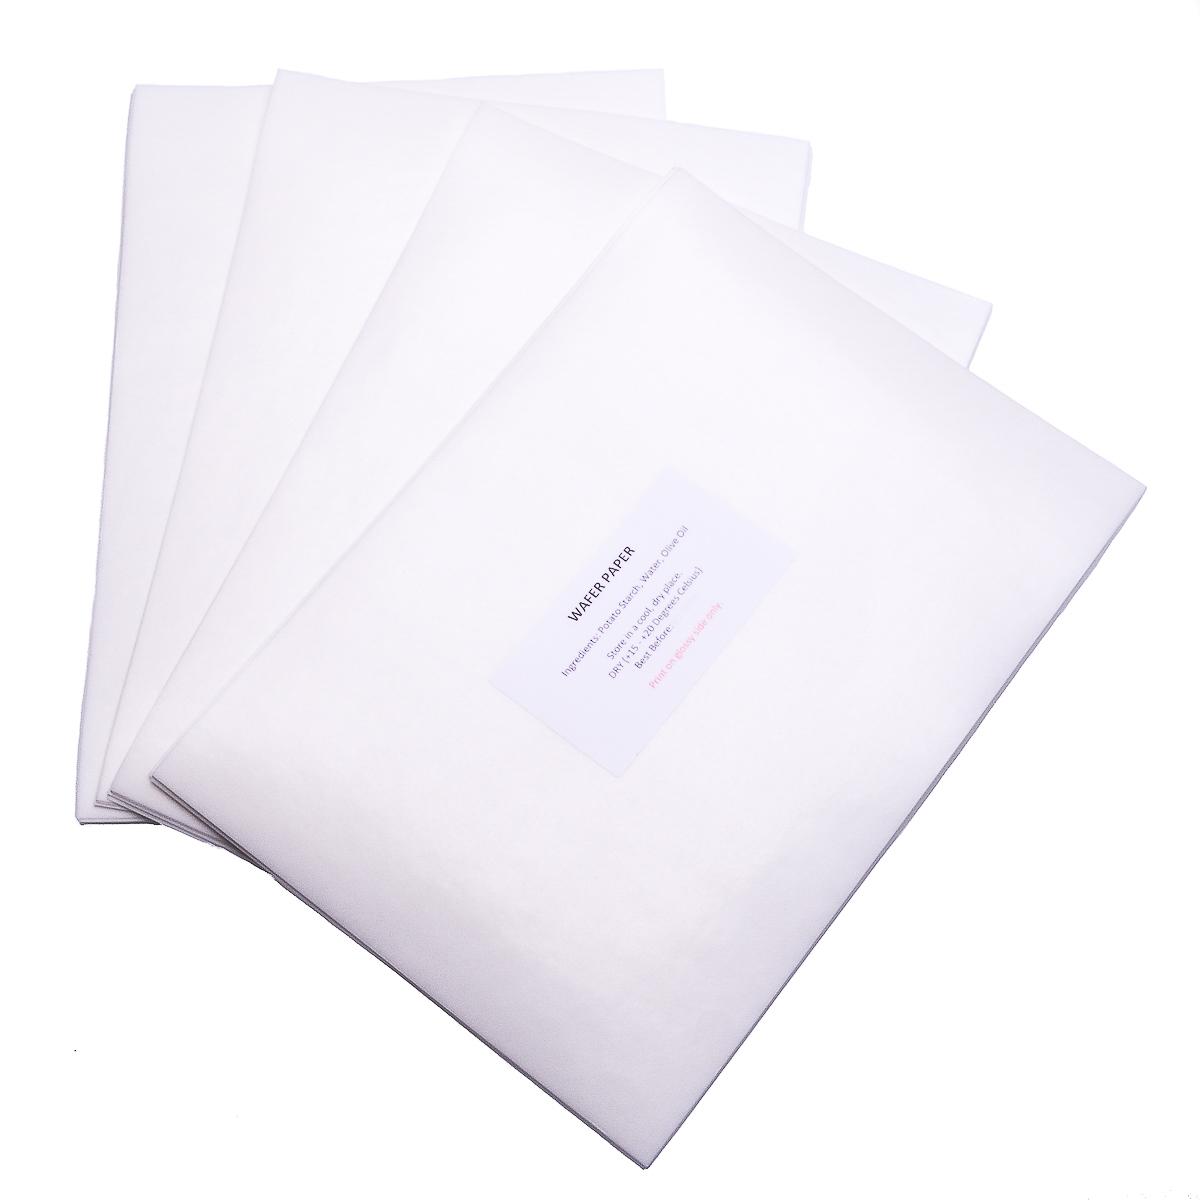 50 wafer paper,templates refillable cartridges EDIBLE PRINTER KIT edible ink